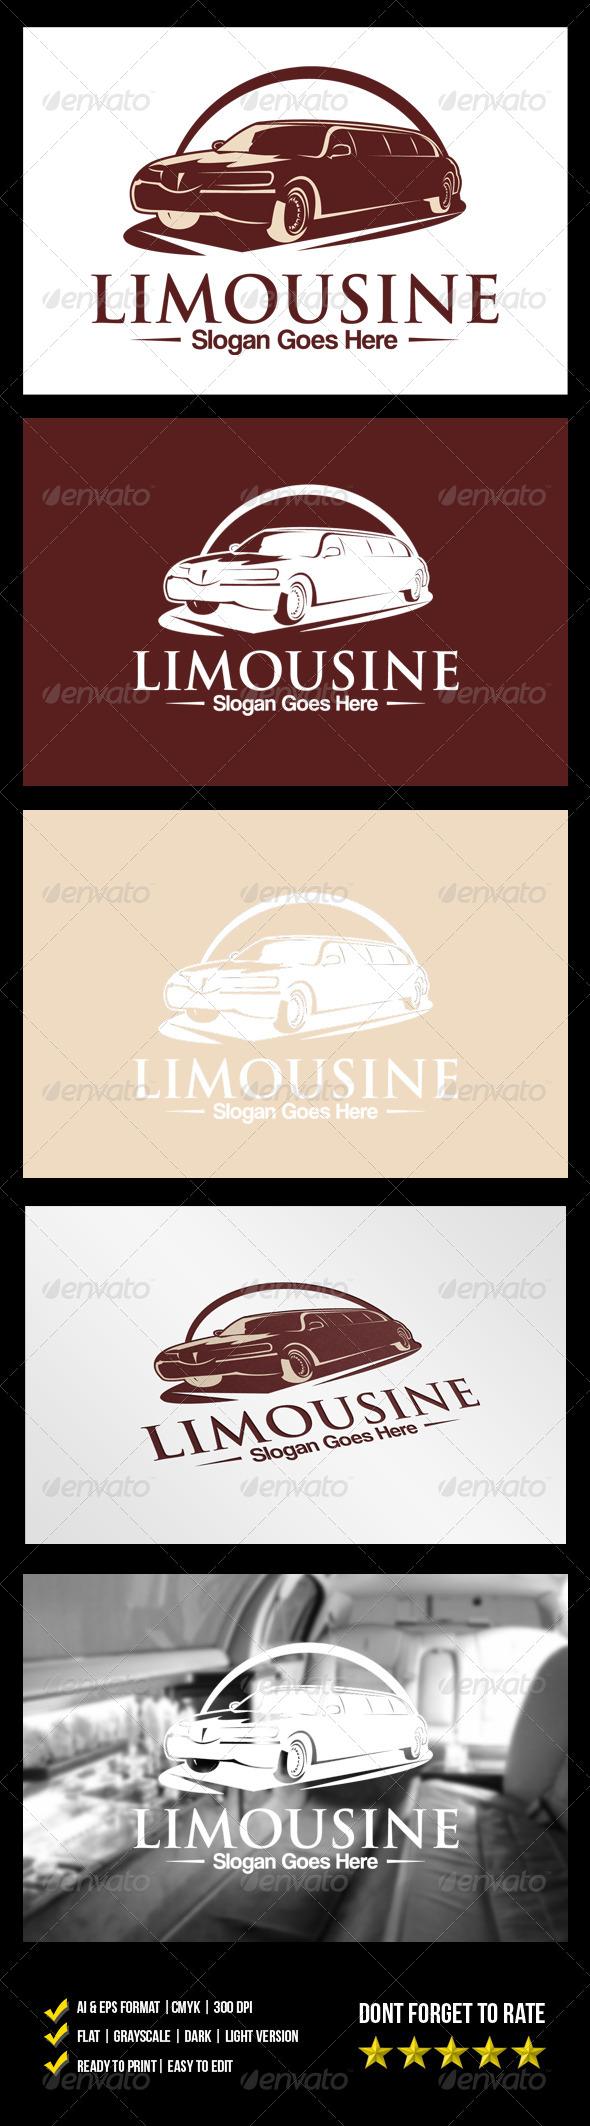 GraphicRiver Limousine Logo 6185282